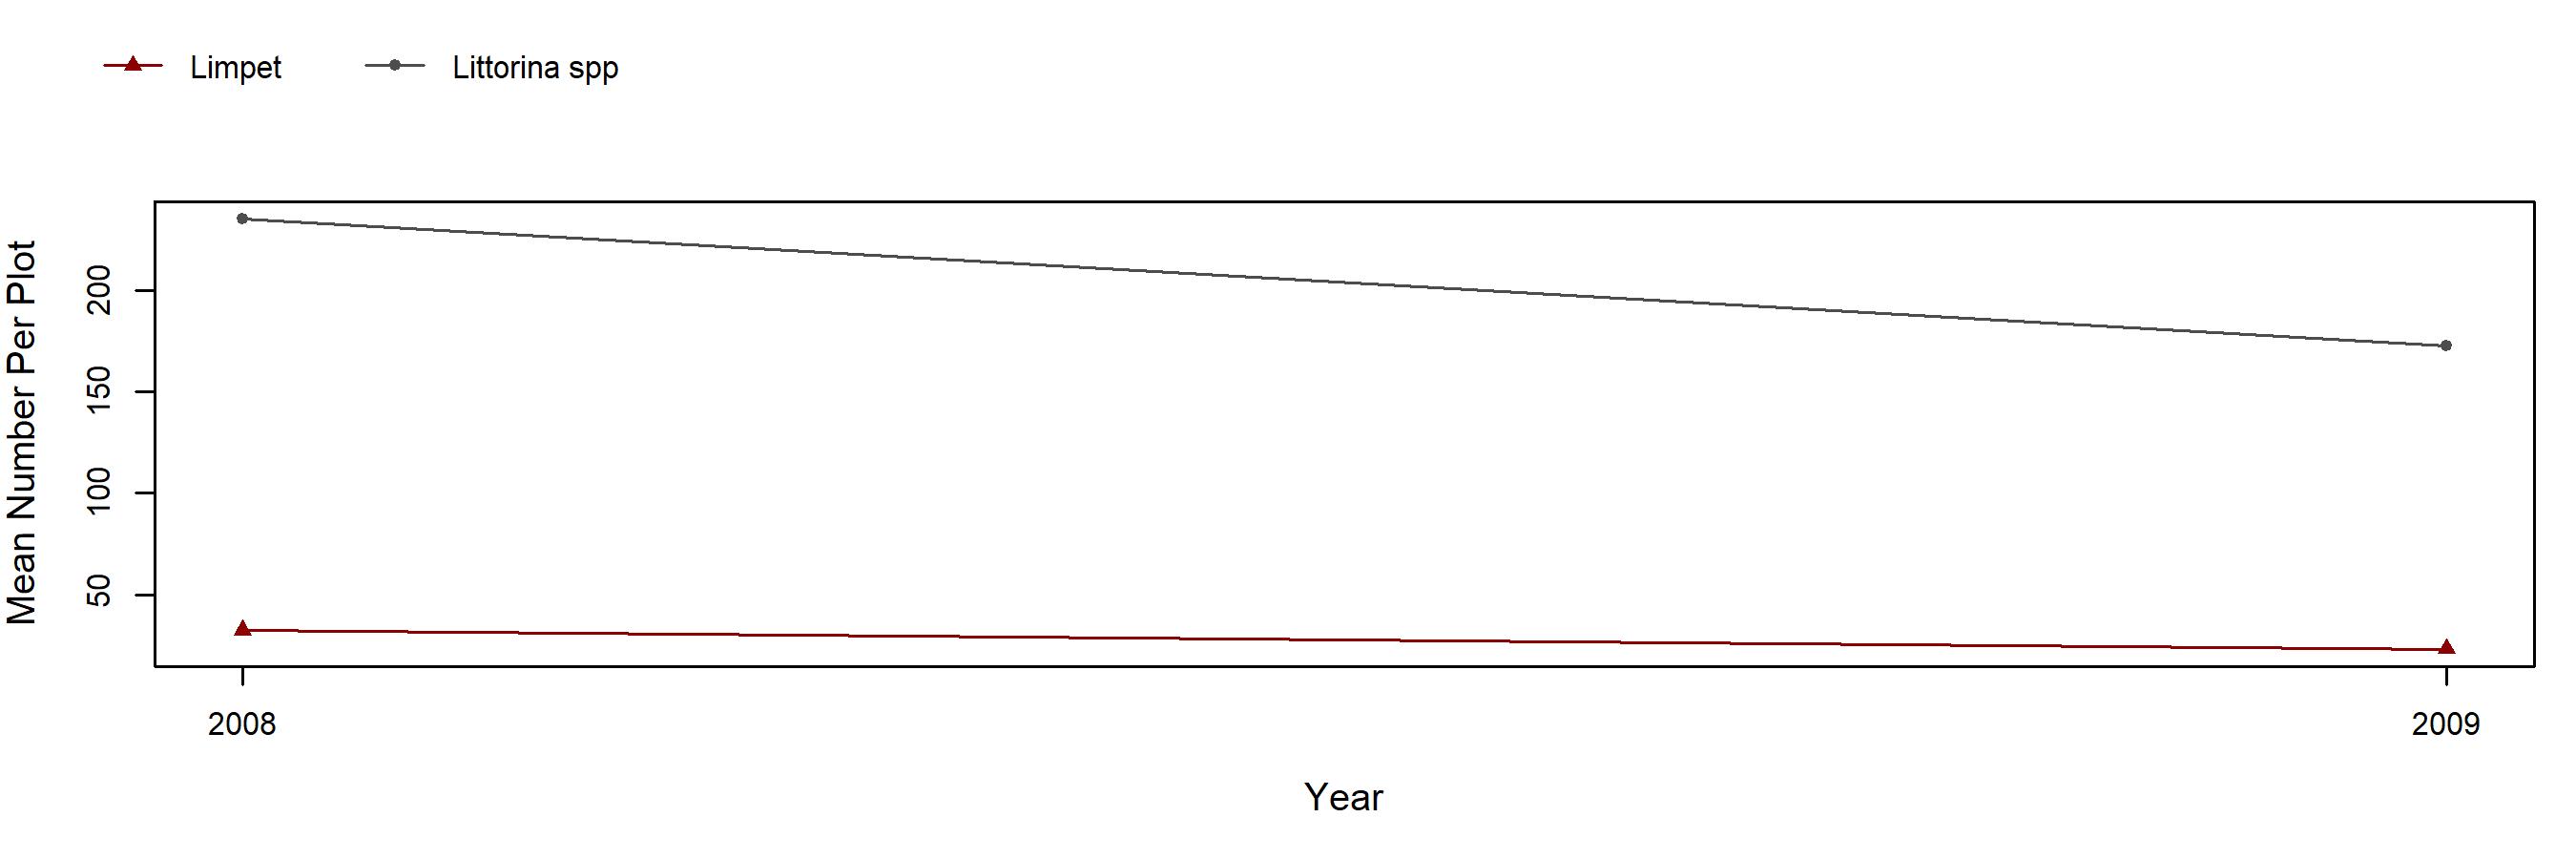 Diablo barnacle trend plot